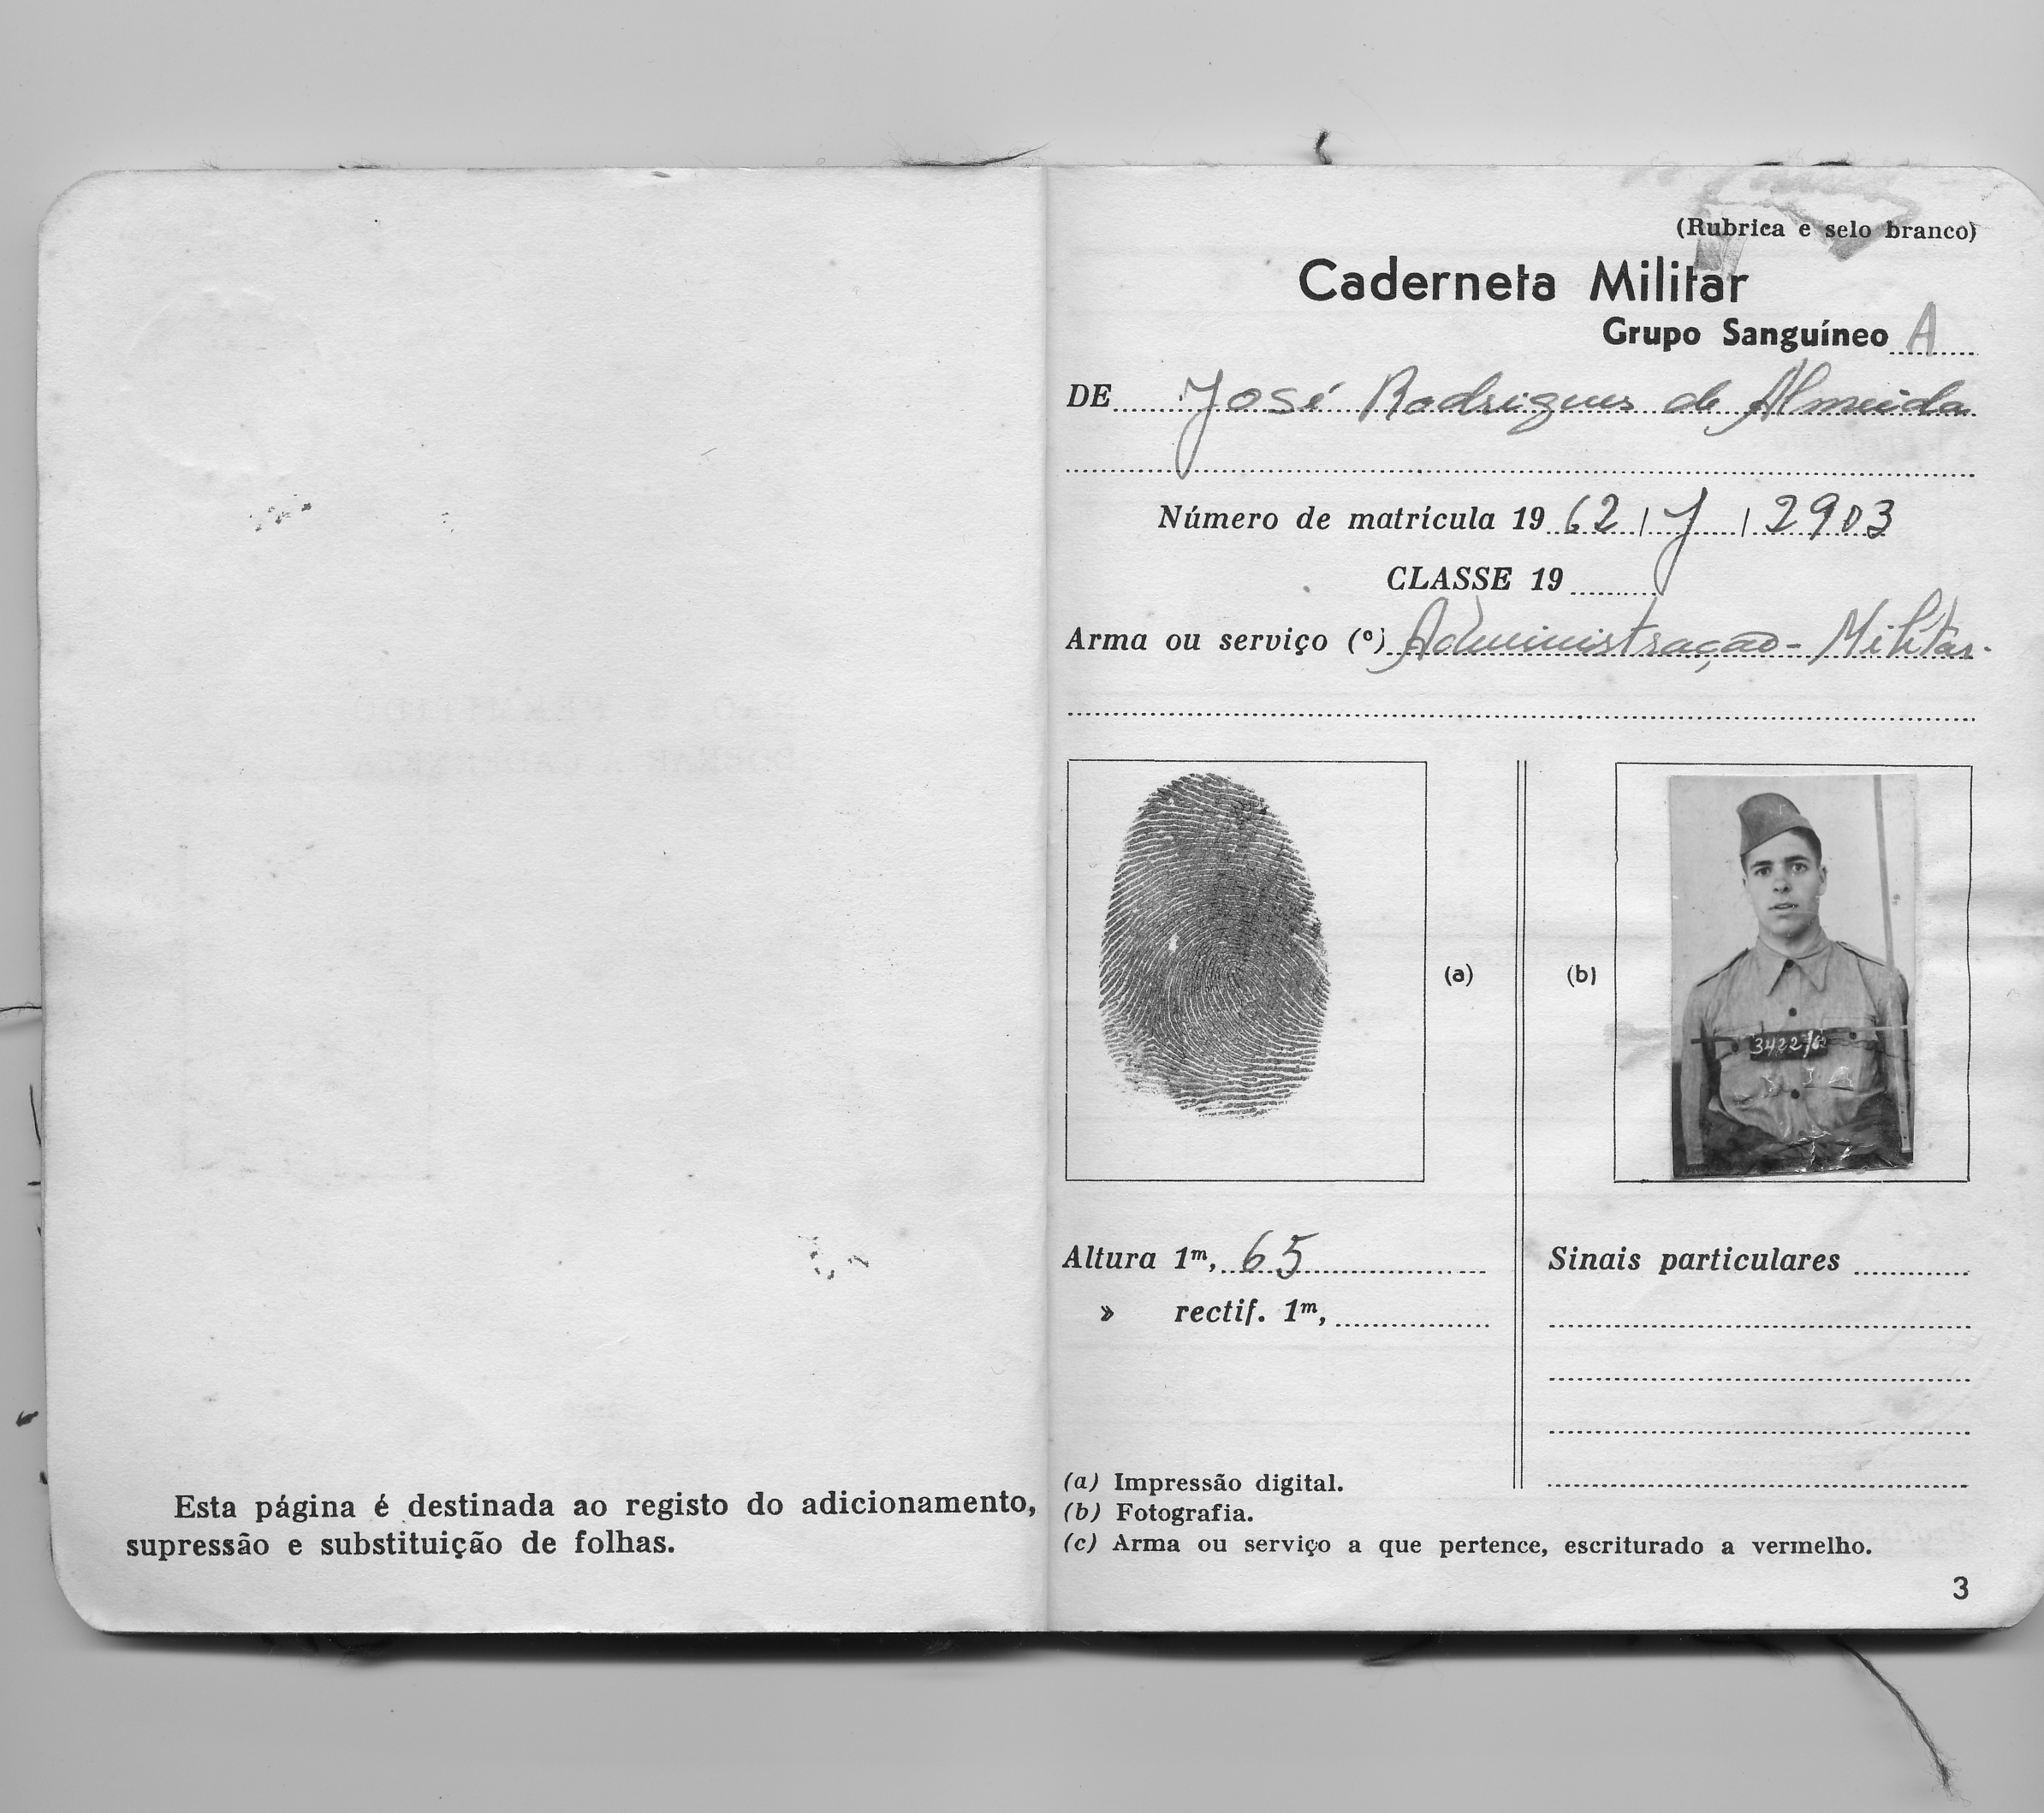 Caderneta Militar